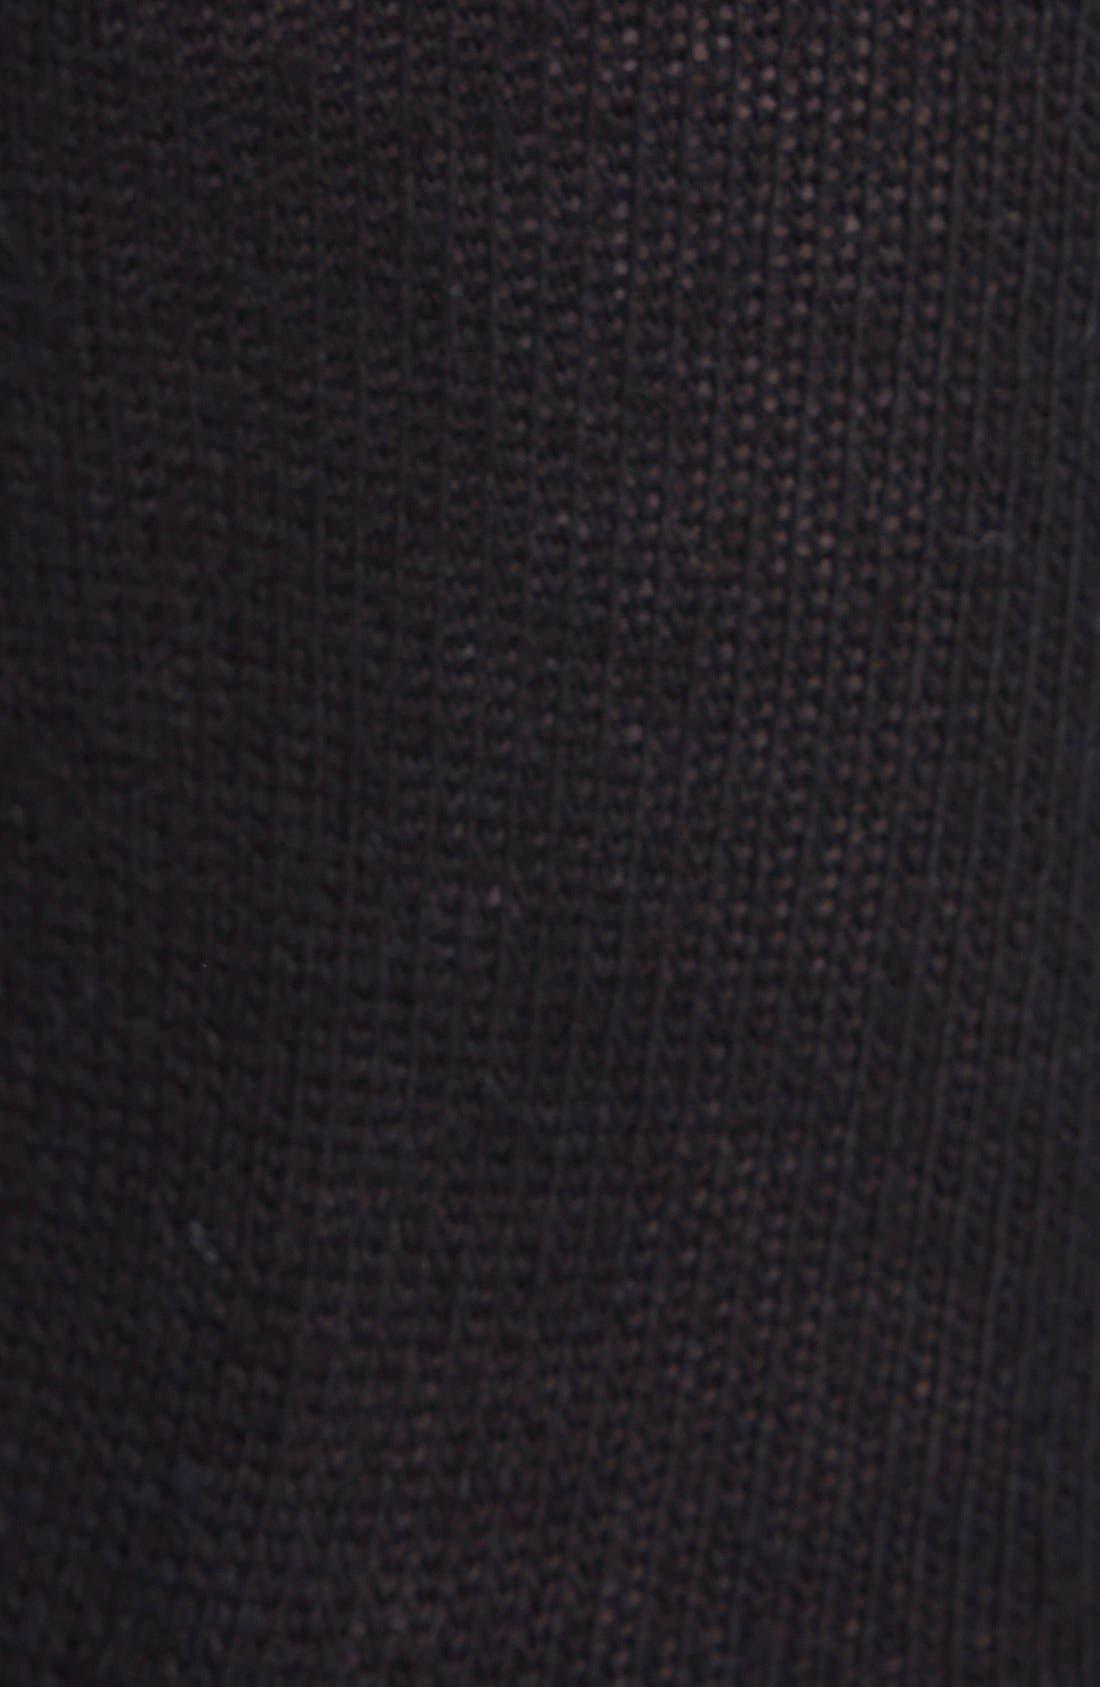 'Luxury' Crew Socks,                             Alternate thumbnail 7, color,